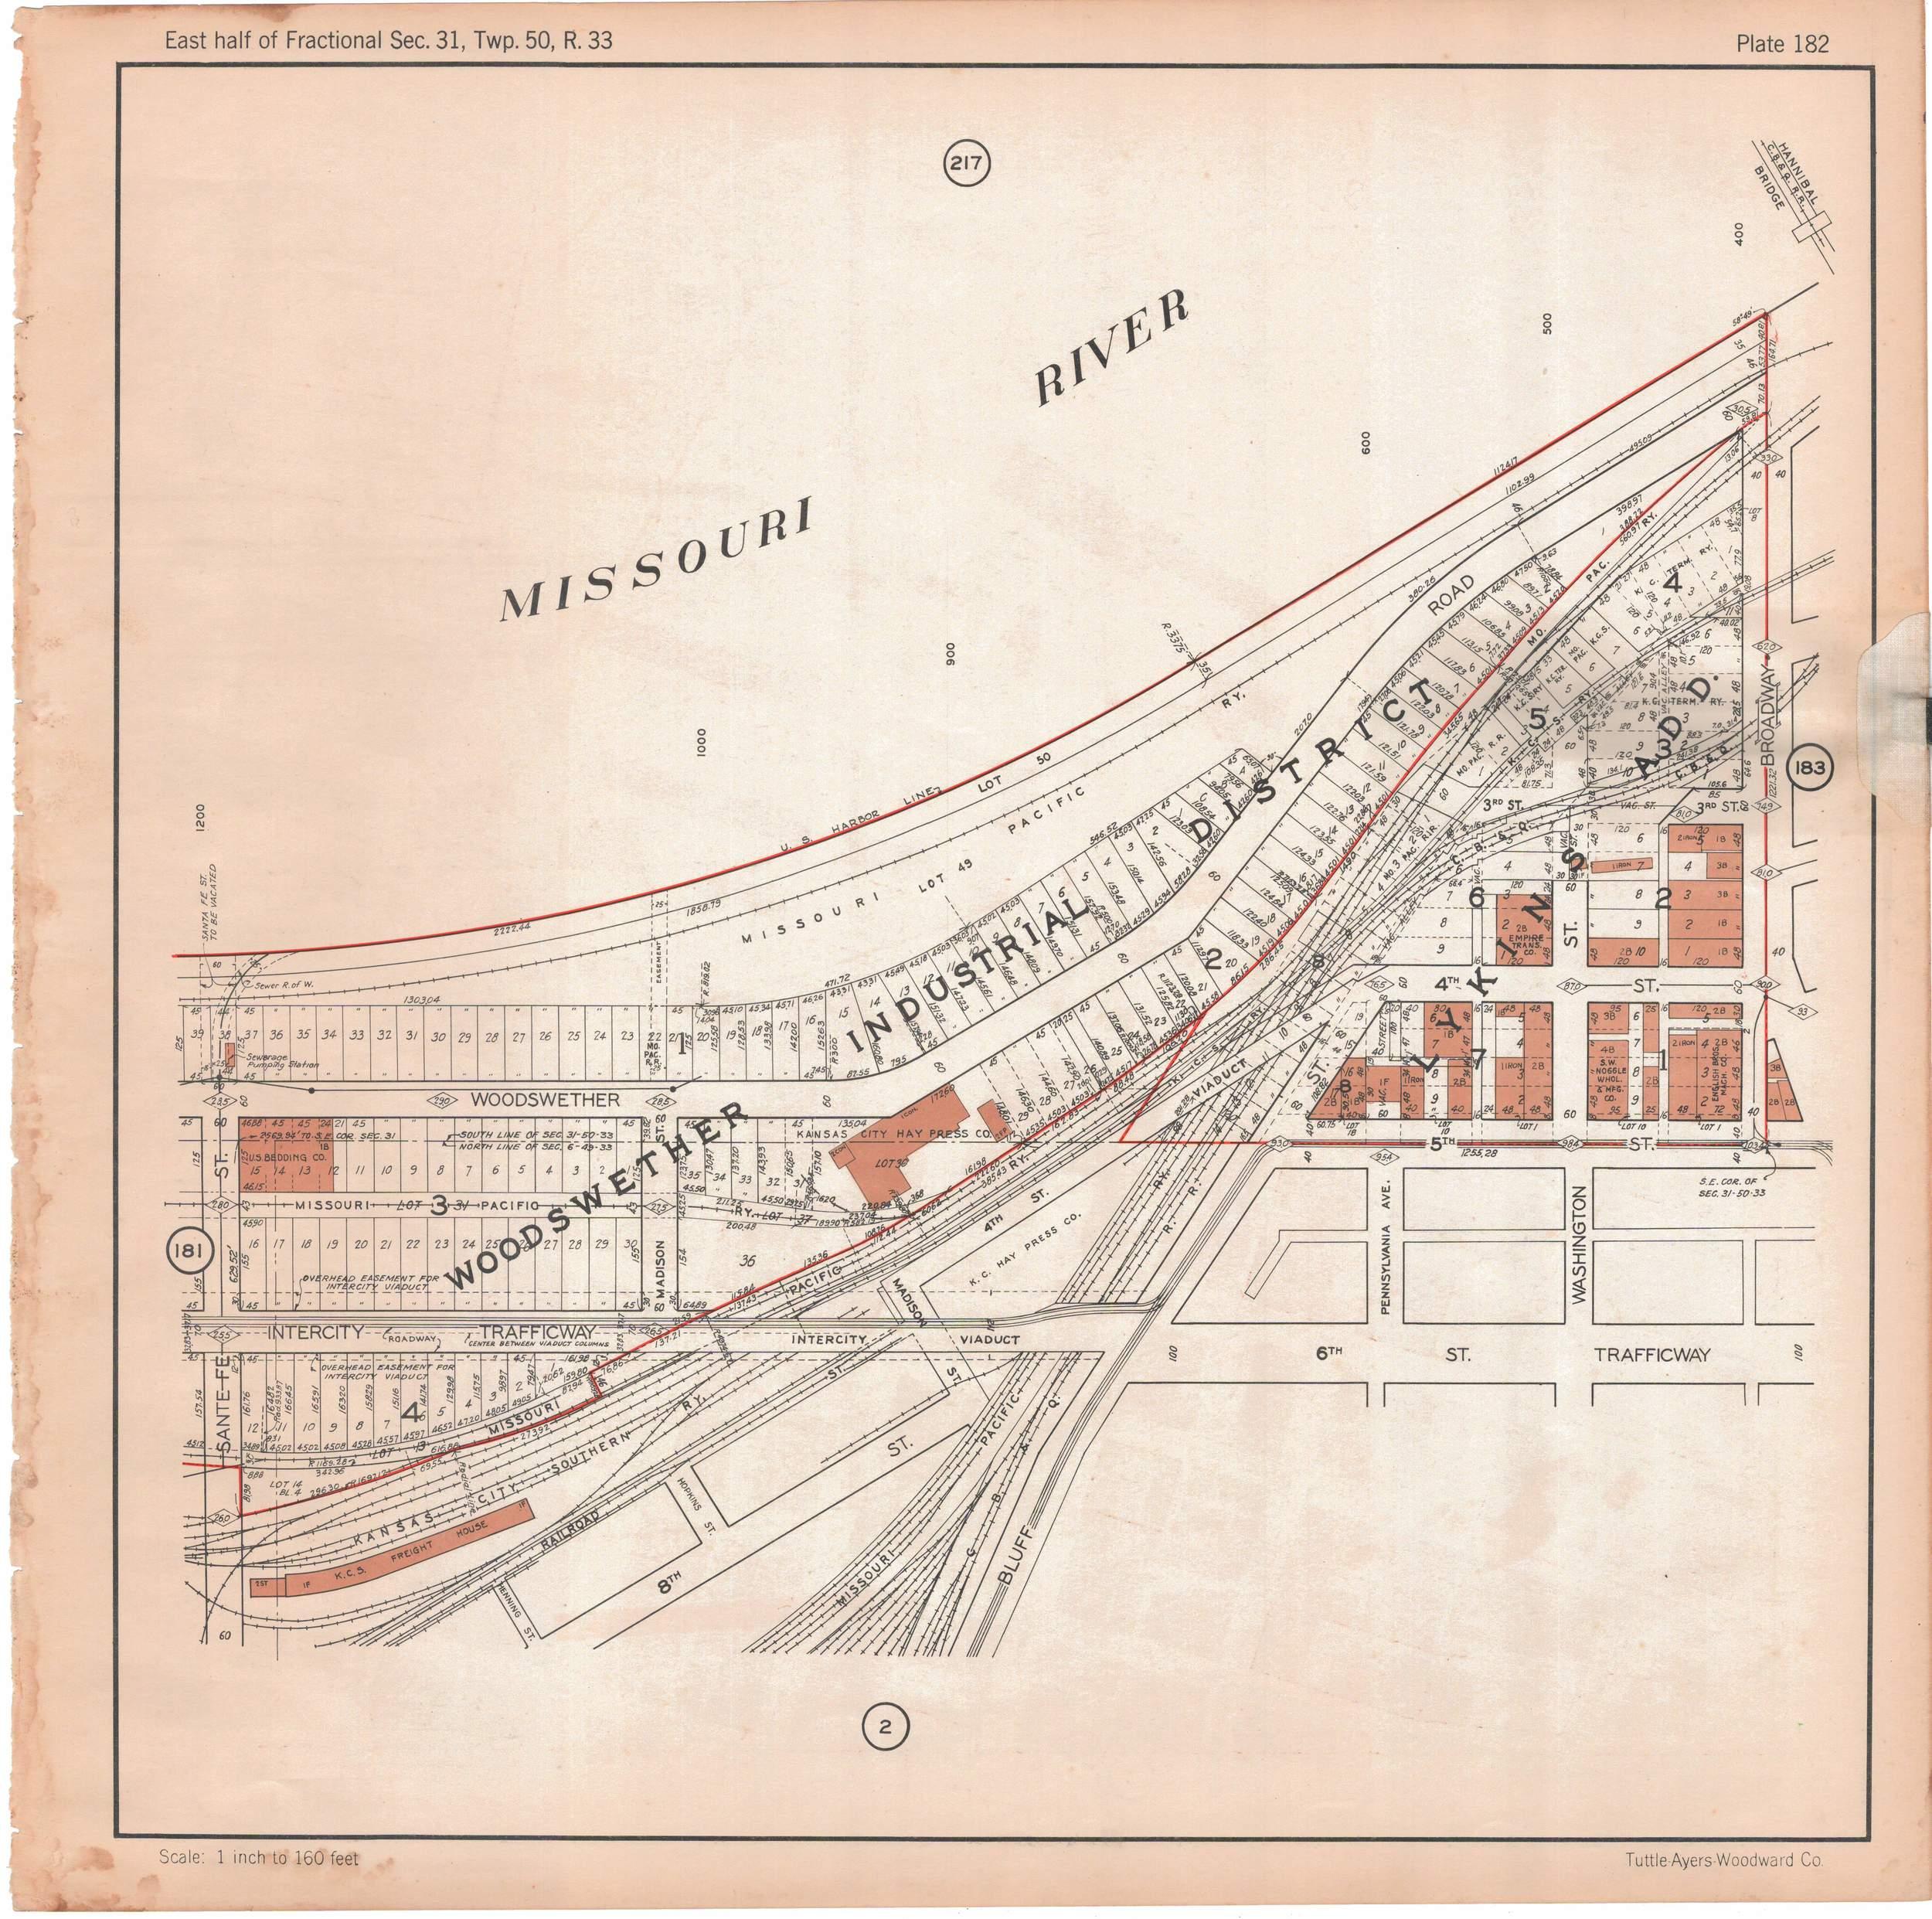 1925 TUTTLE_AYERS_Plate_182.JPG